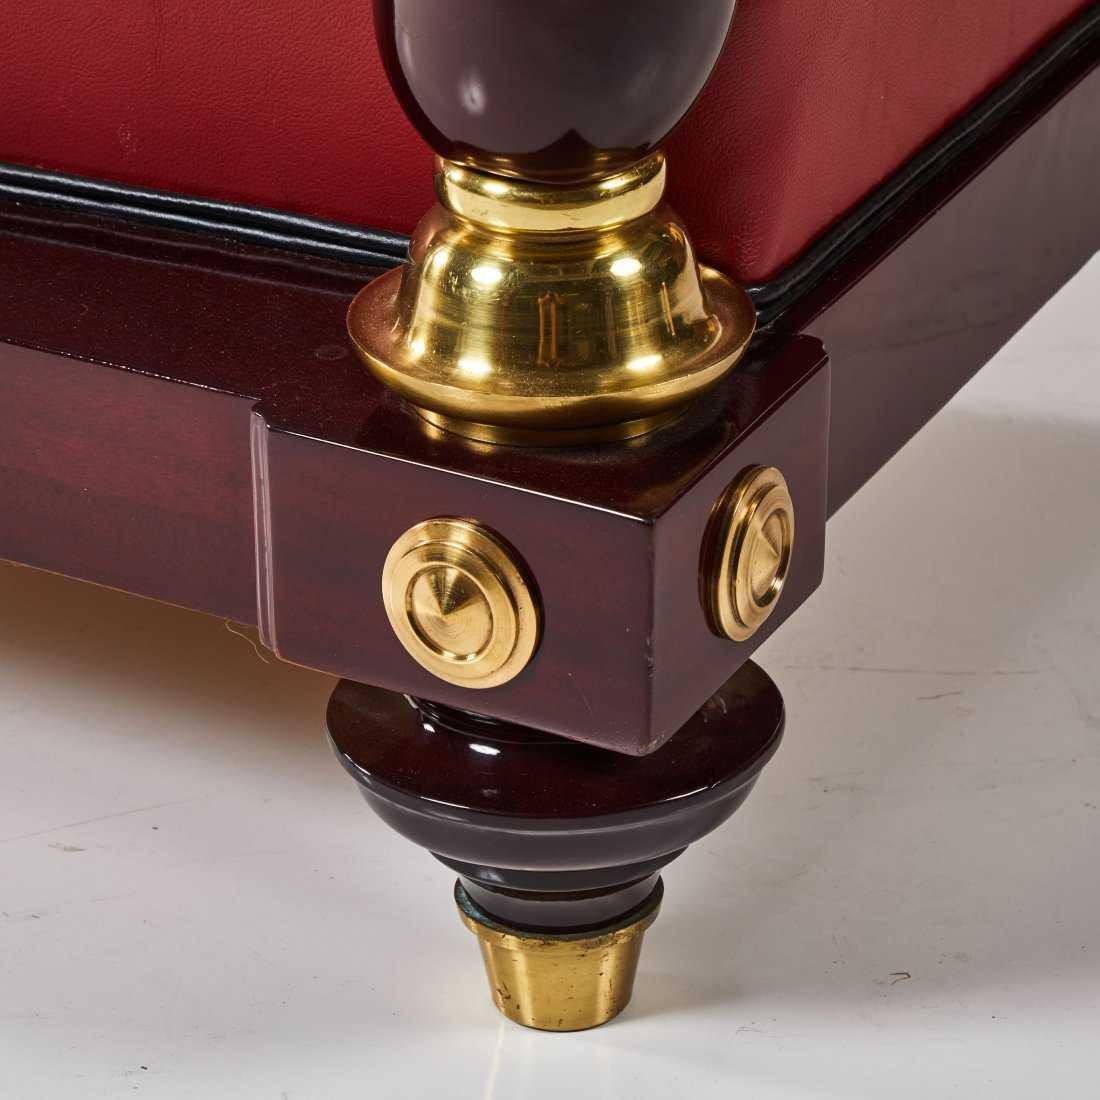 Octavio Vidales Lounge Chairs - 3